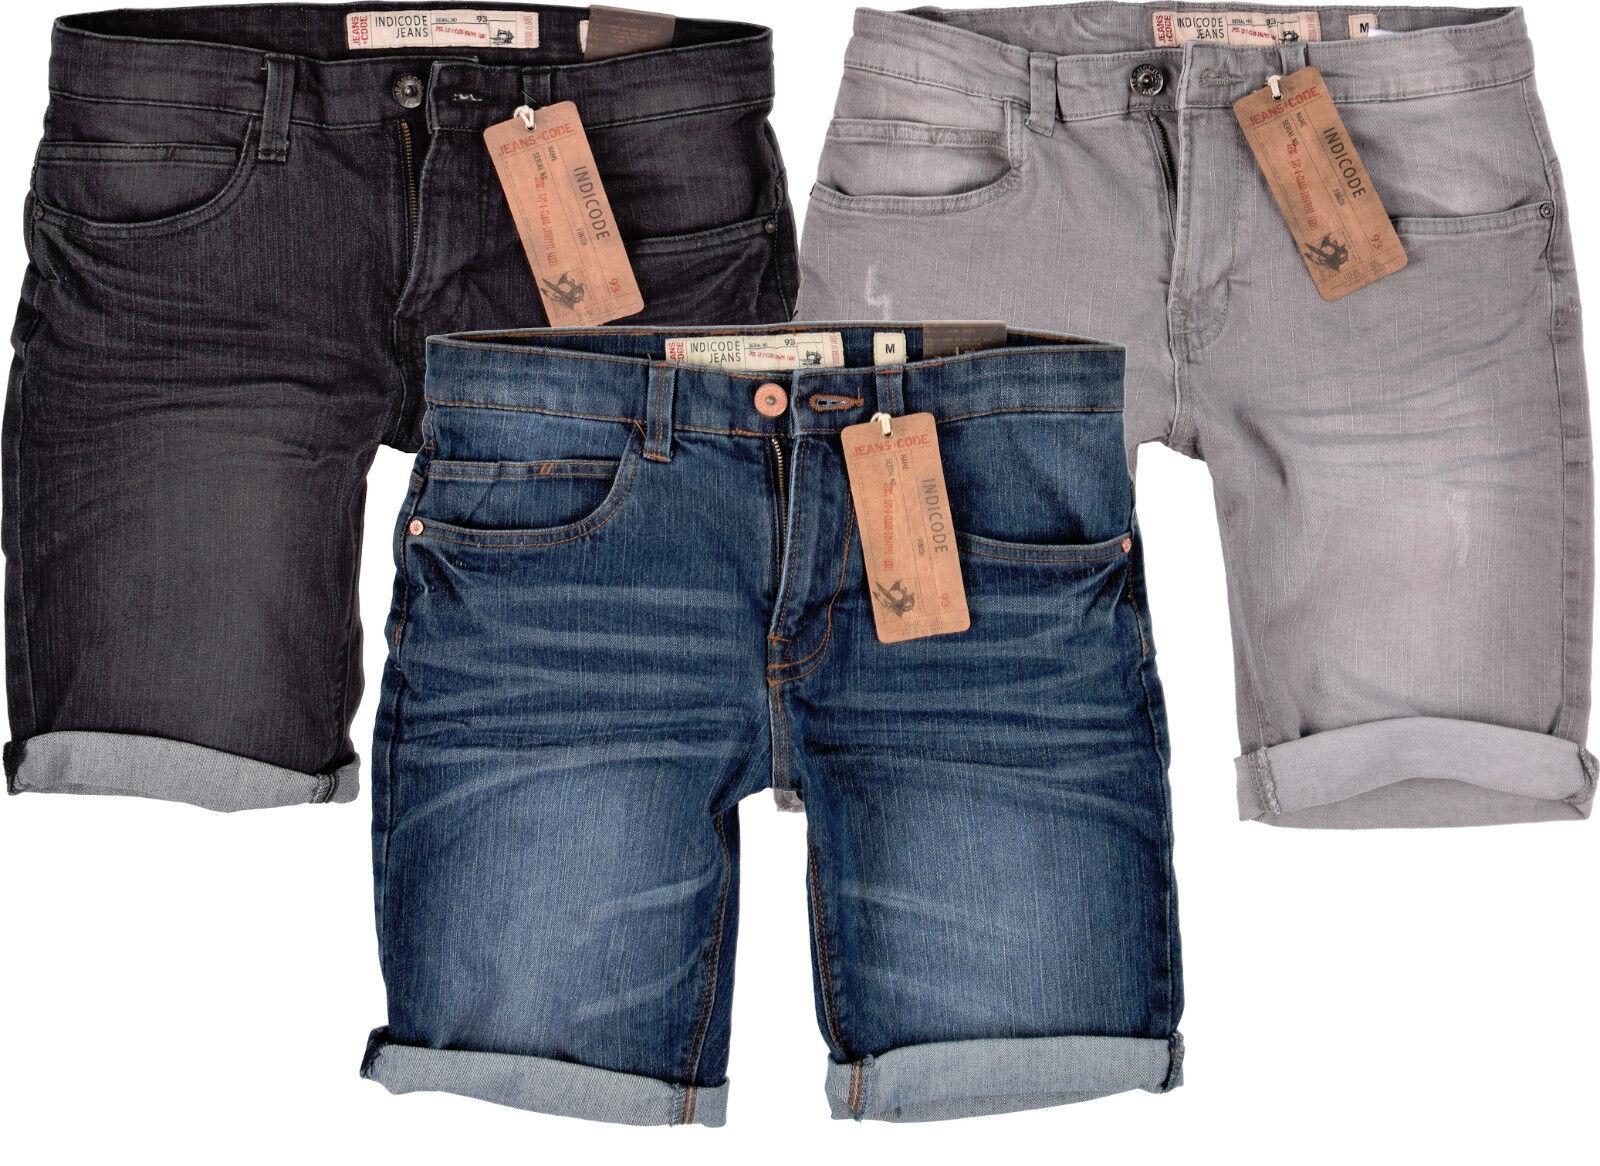 Men's Shorts indicode Jeans Shorts Slim Fit Stretch Denim Shorts Kaden